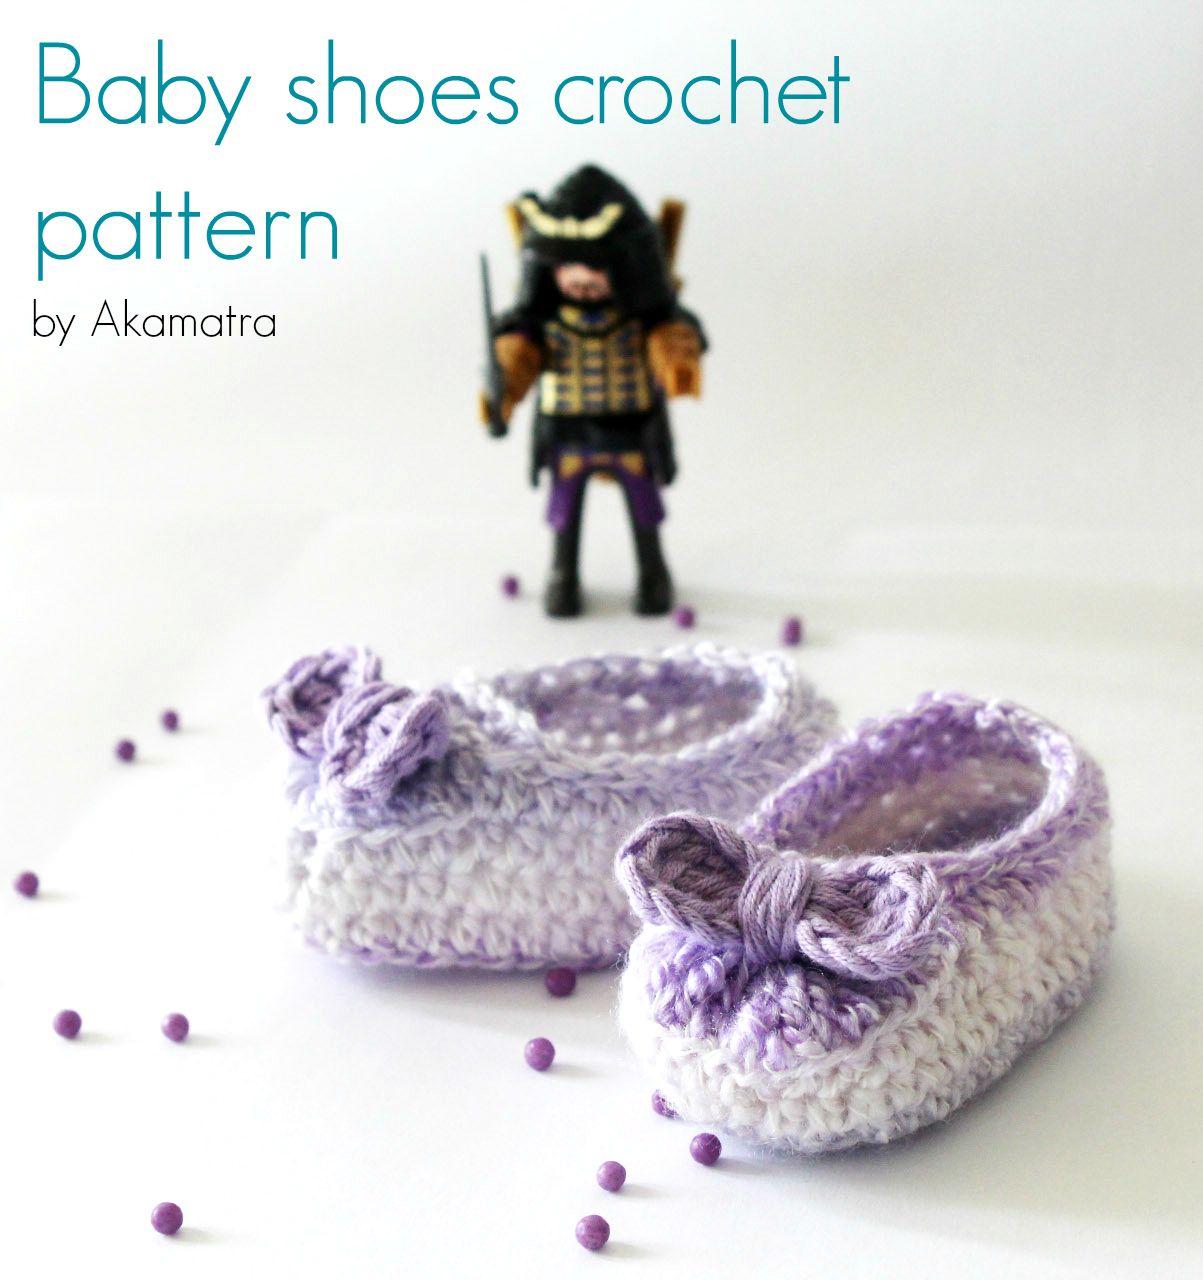 Baby shoes crochet pattern | Para bebés, Bebé y Sandalias